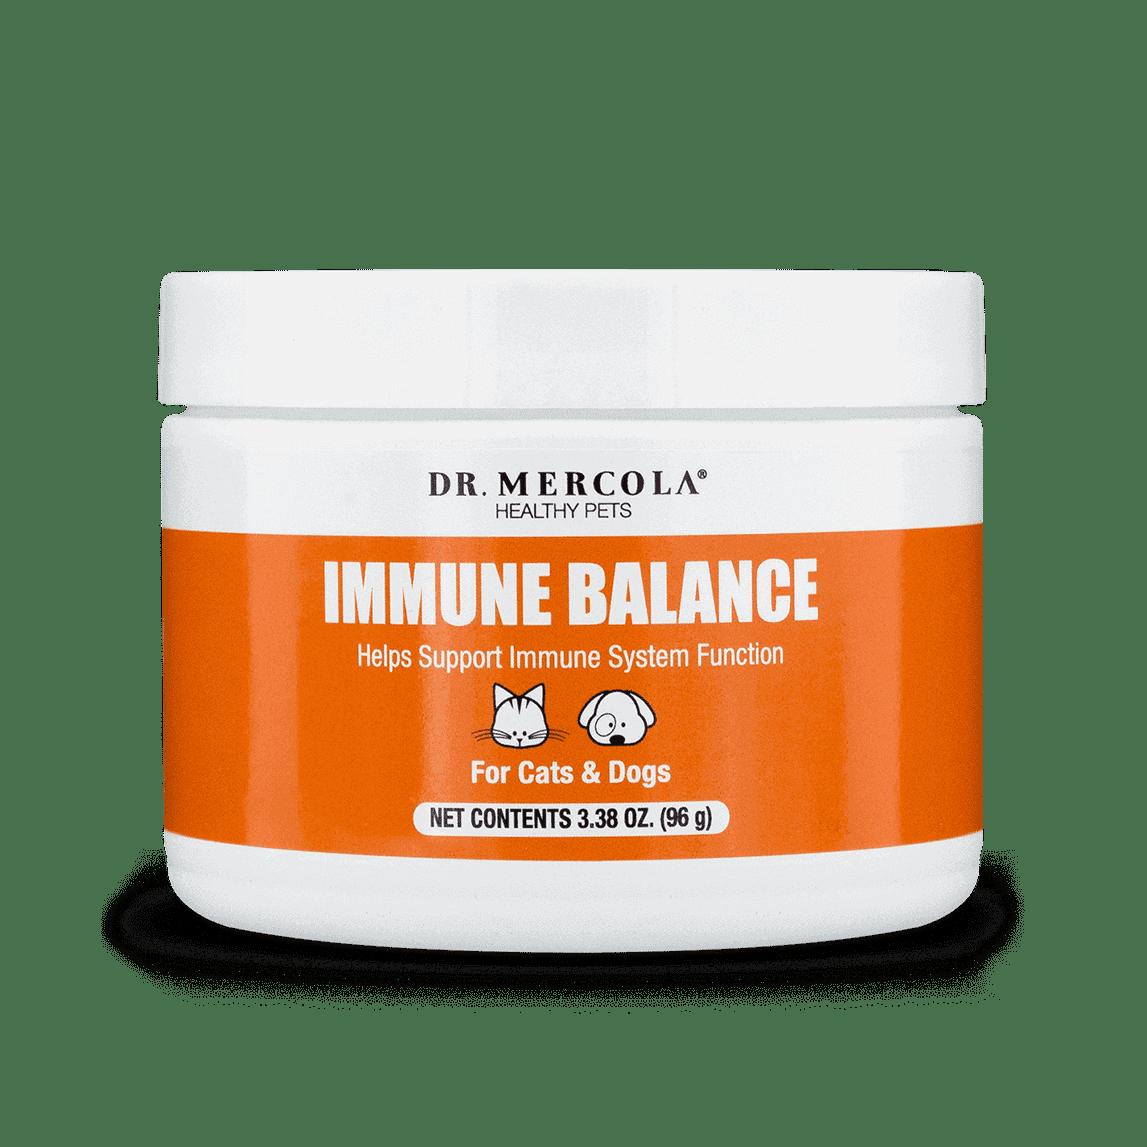 Immune Balance for Pets